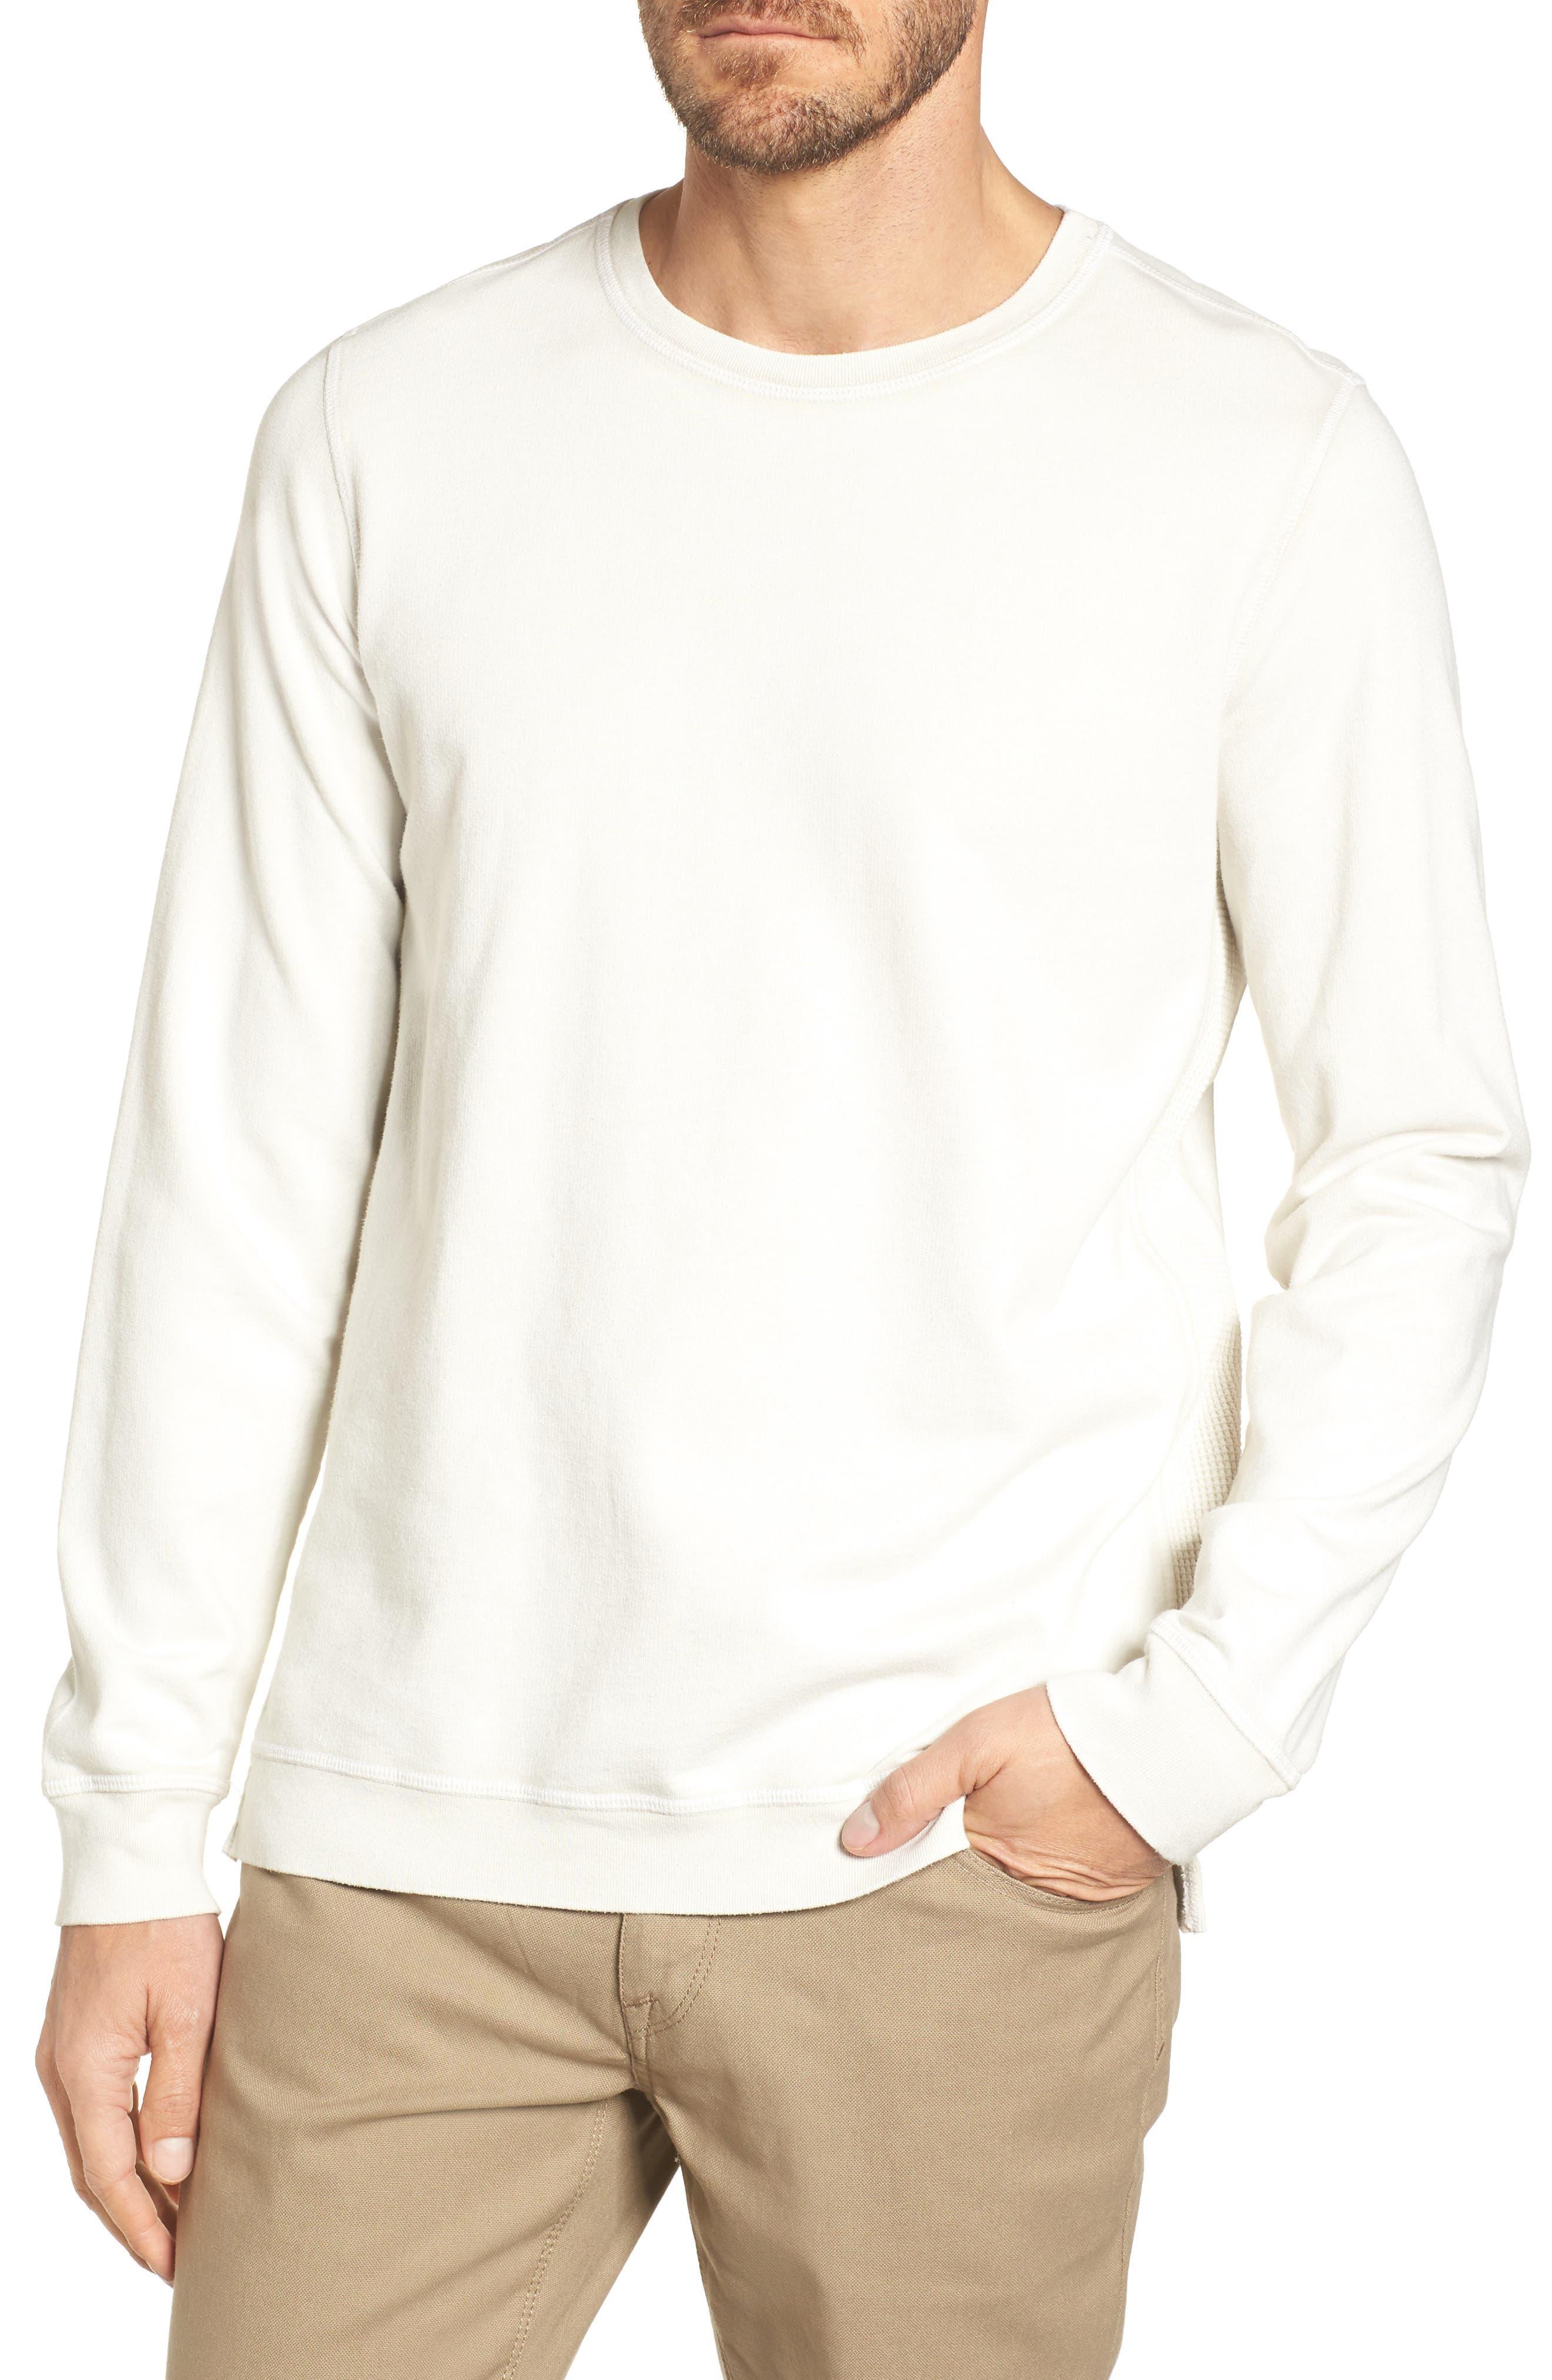 Max Slim Long Sleeve T-Shirt,                             Main thumbnail 1, color,                             Sunbaked Moonglade